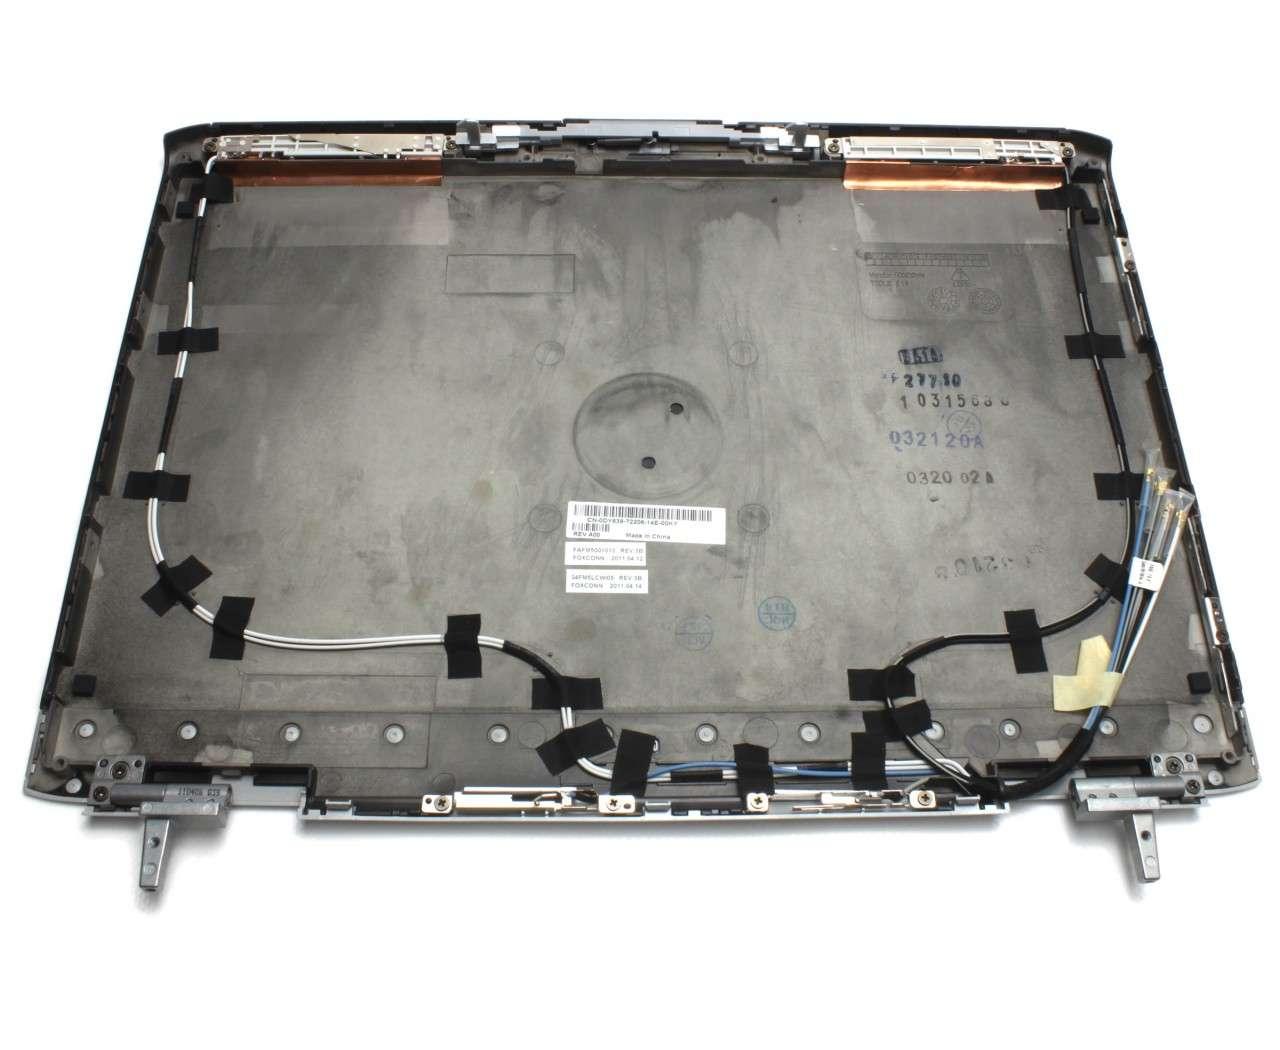 Capac Display BackCover Dell 34FM5LCWI05 Carcasa Display imagine powerlaptop.ro 2021